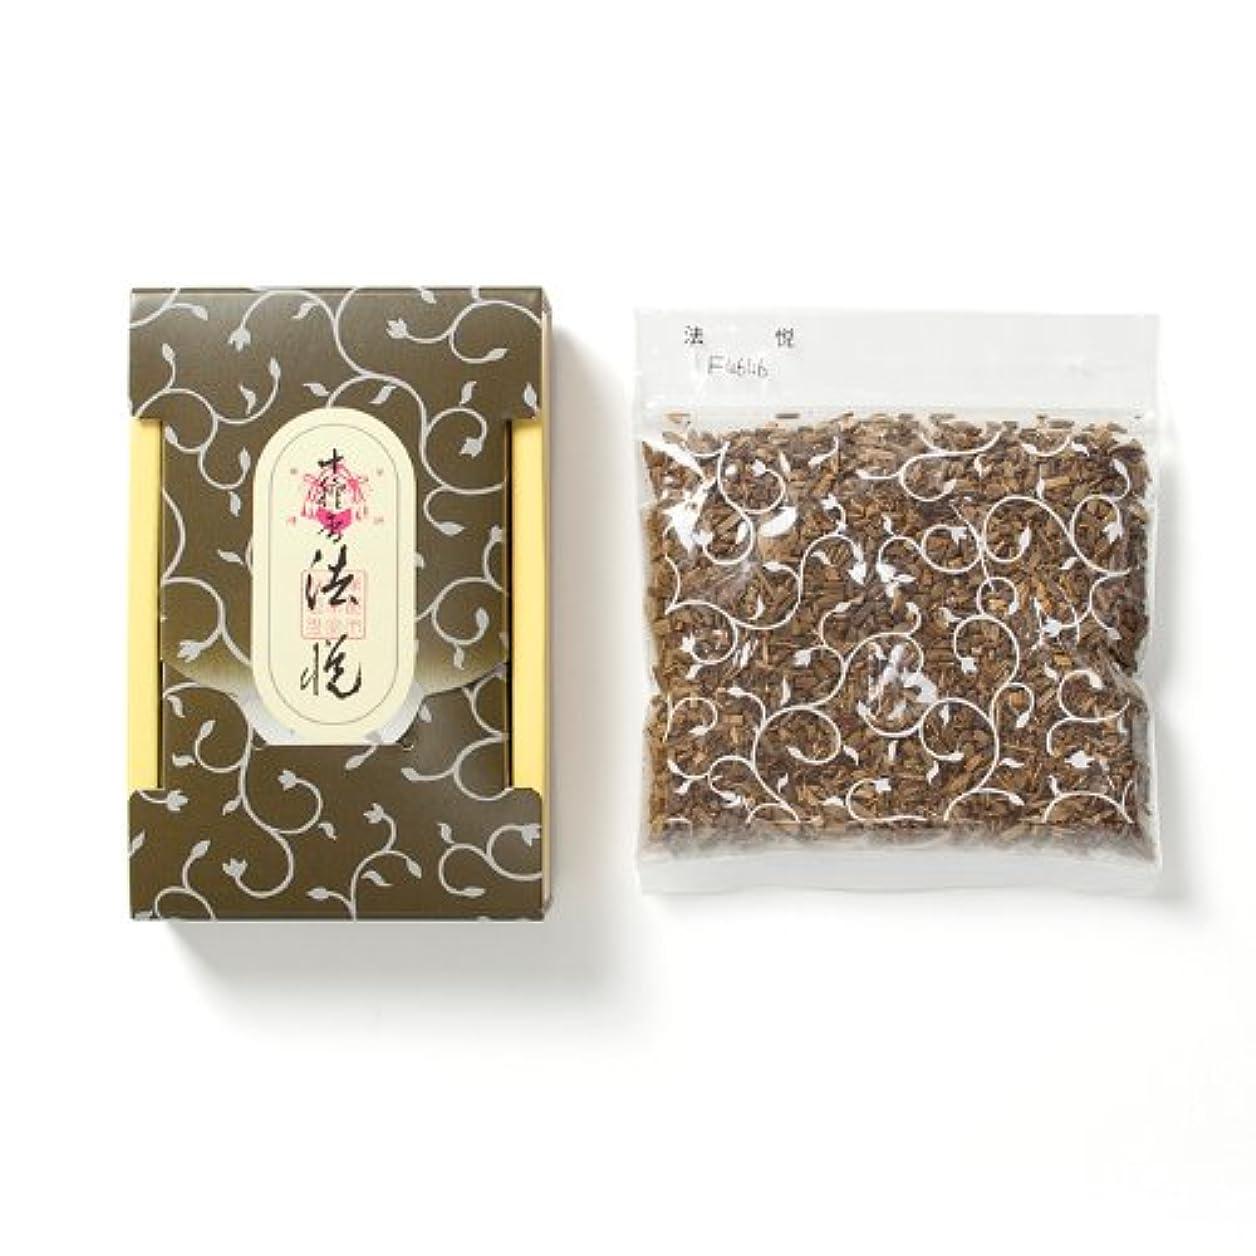 松栄堂のお焼香 十種香 法悦 25g詰 小箱入 #411041